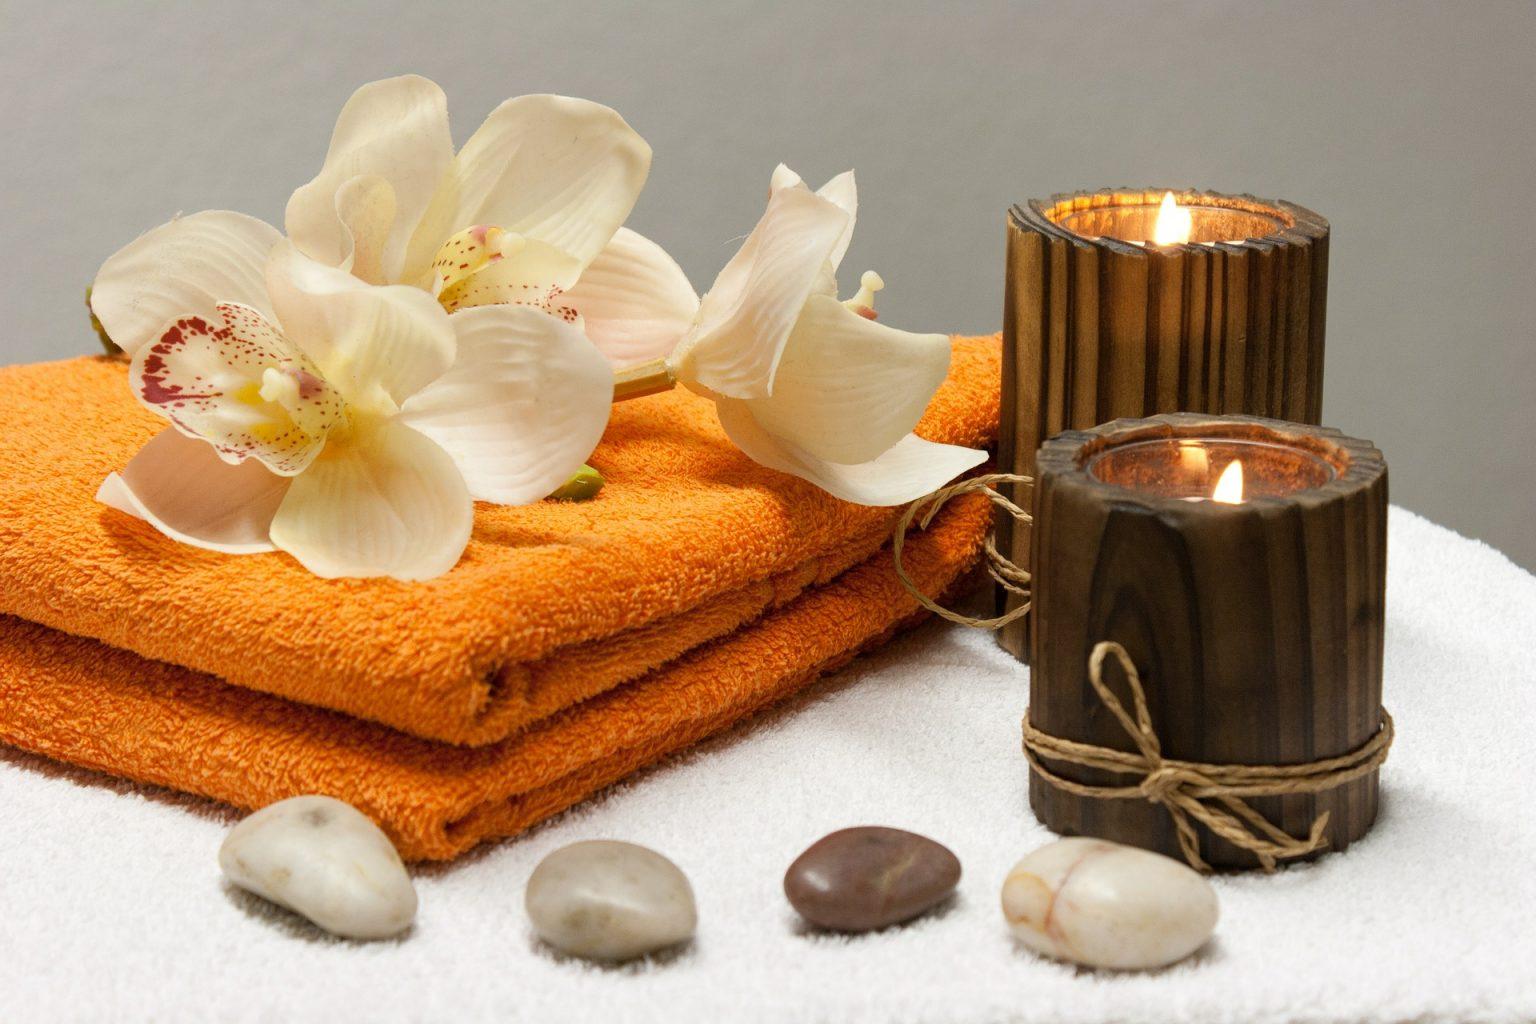 Erotic Massage Vienna - How to Refresh Yourself With Bijou